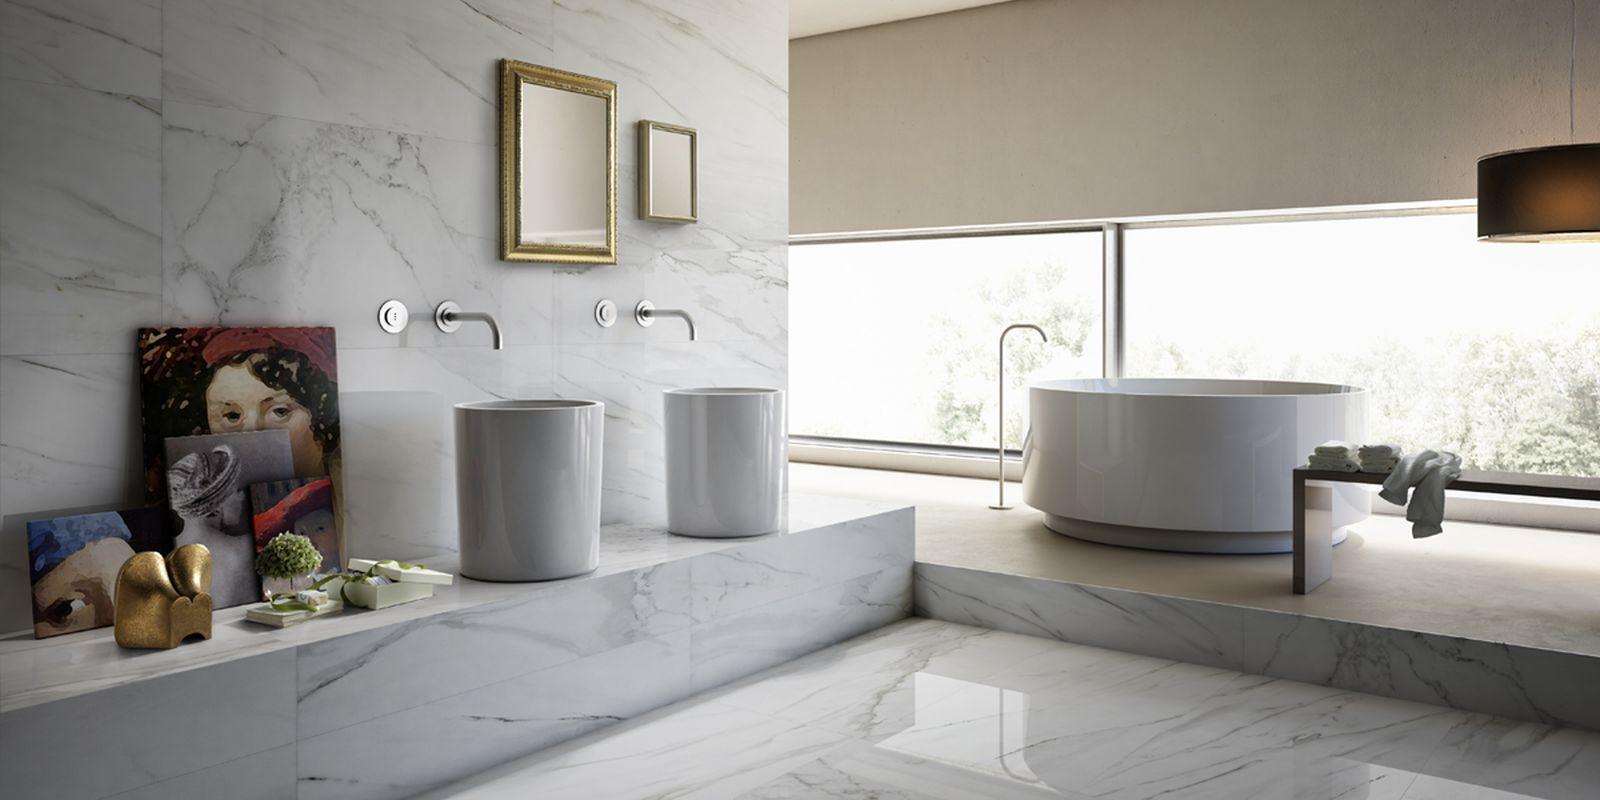 bagno moderno in marmo | sweetwaterrescue - Arredo Bagno Moderno In Marmo